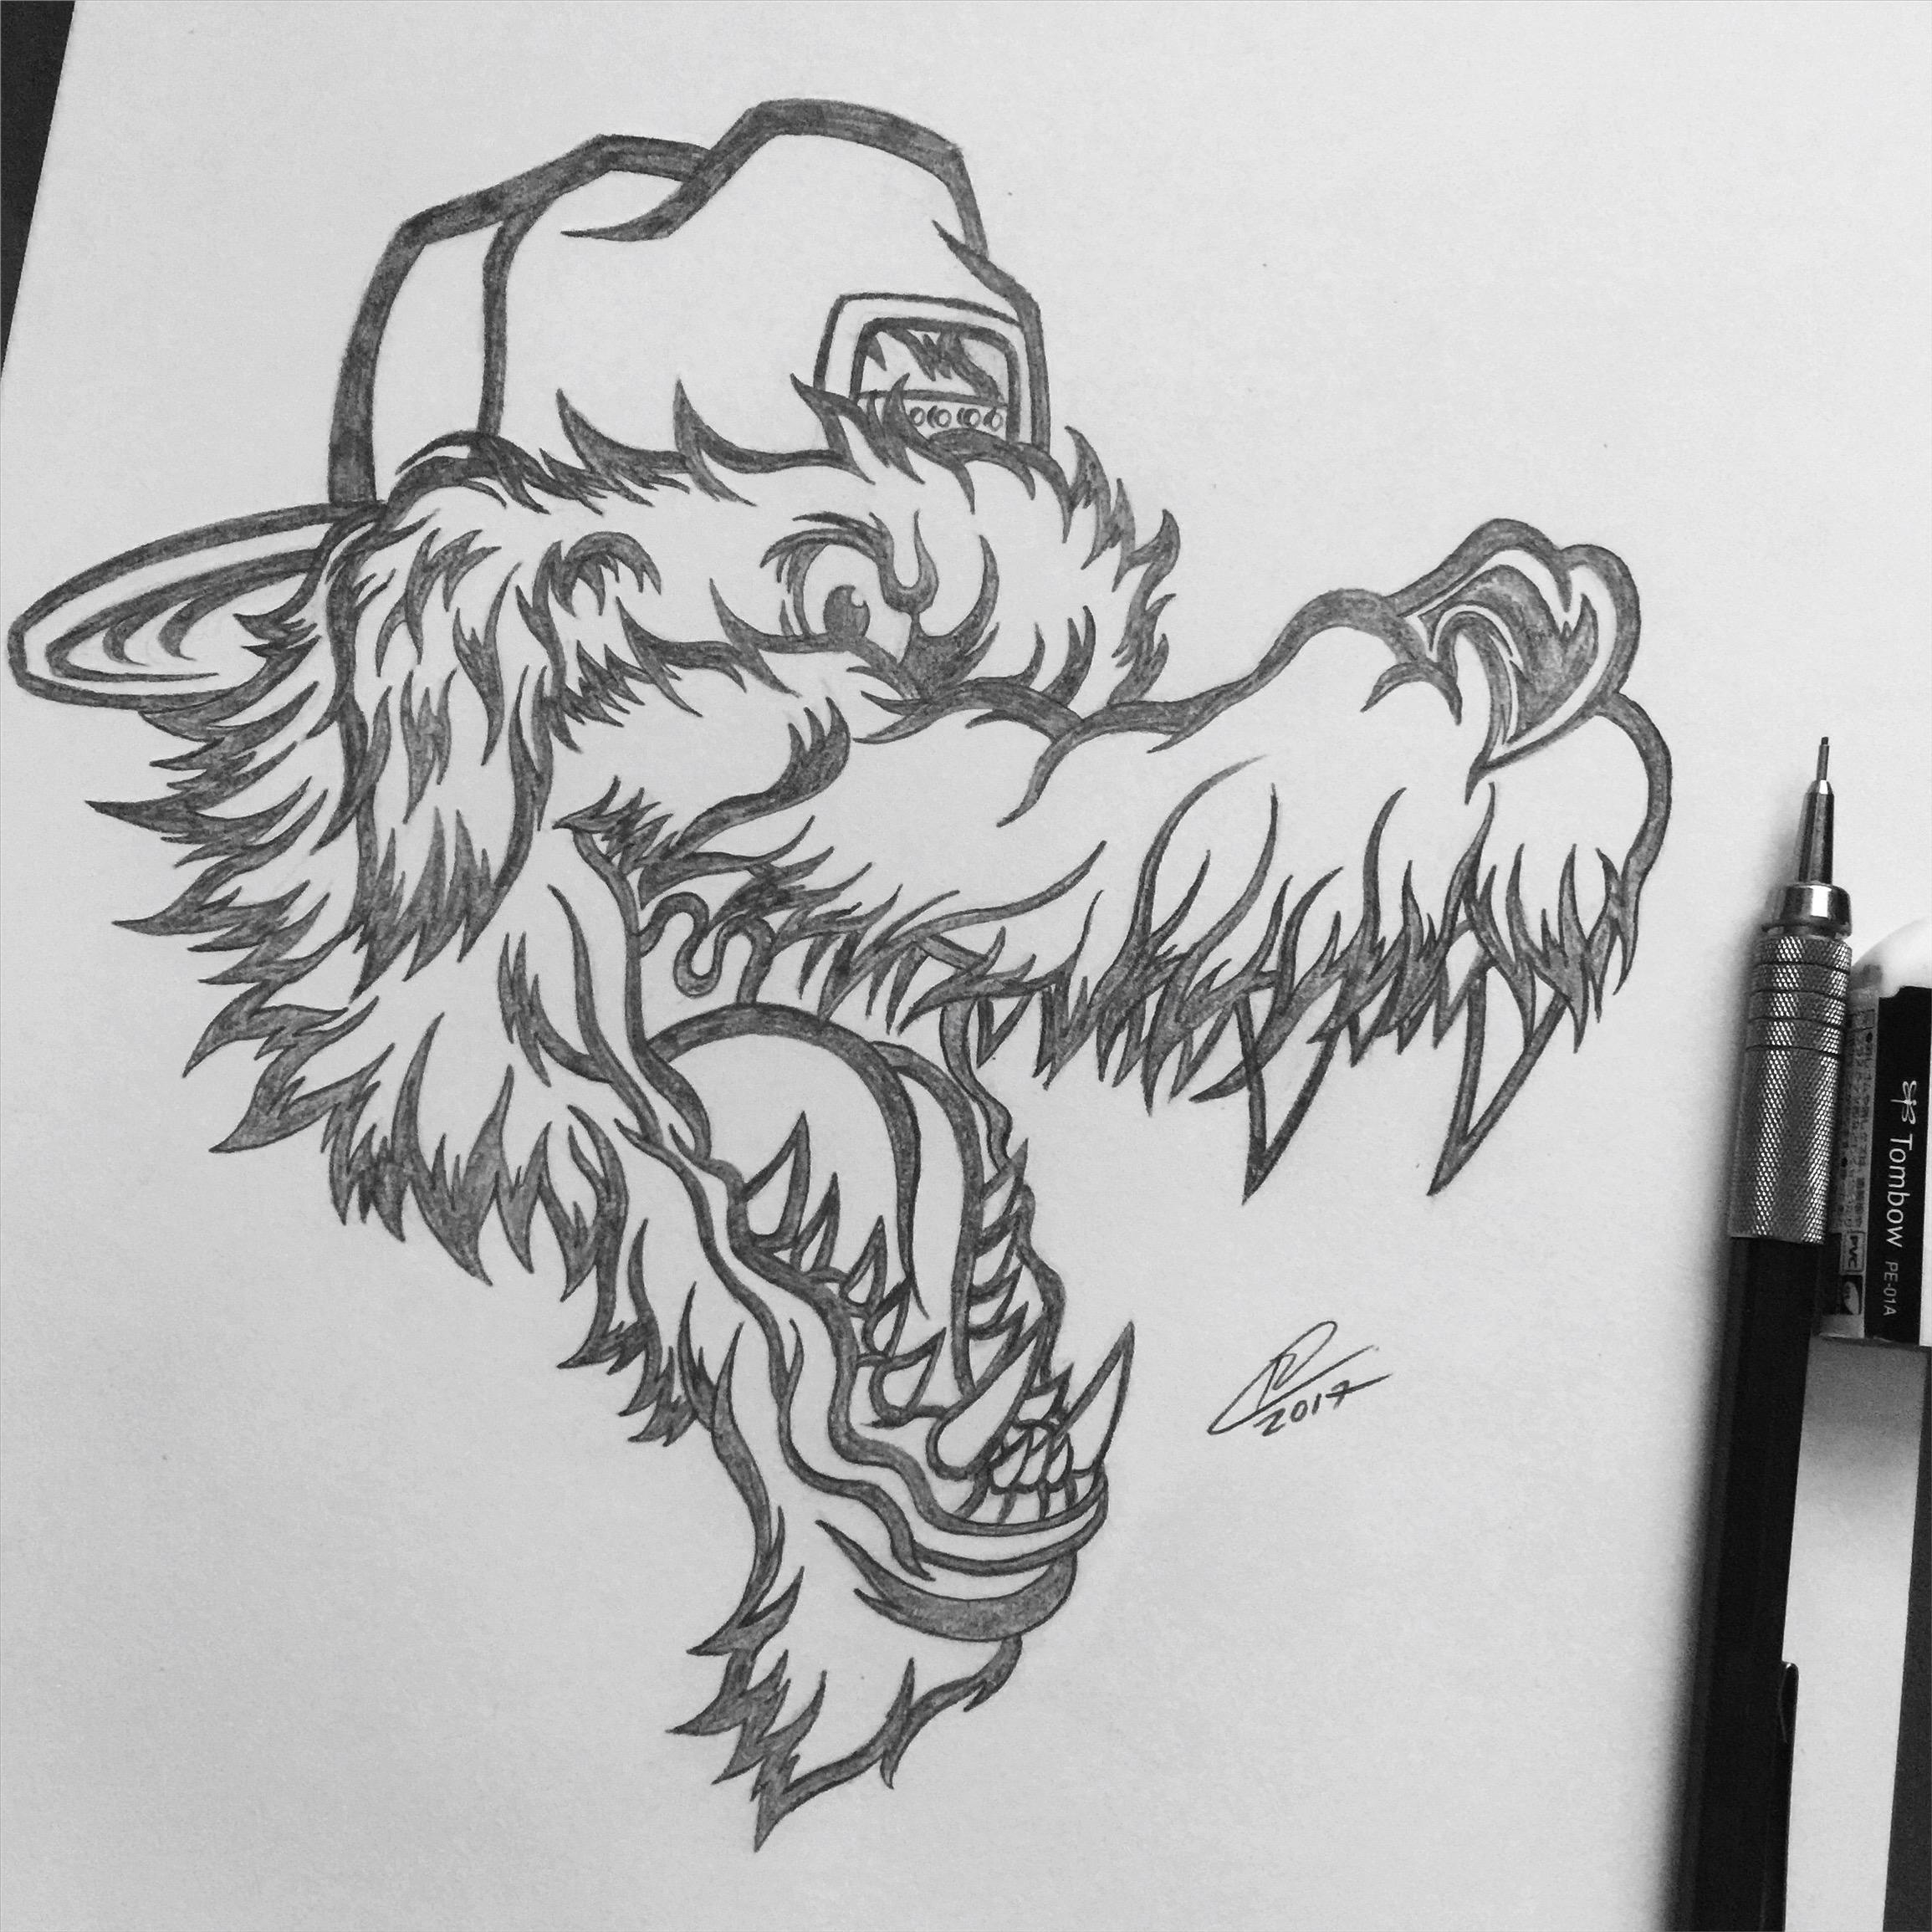 ODS-dog-sketch-orozcodesign.jpg